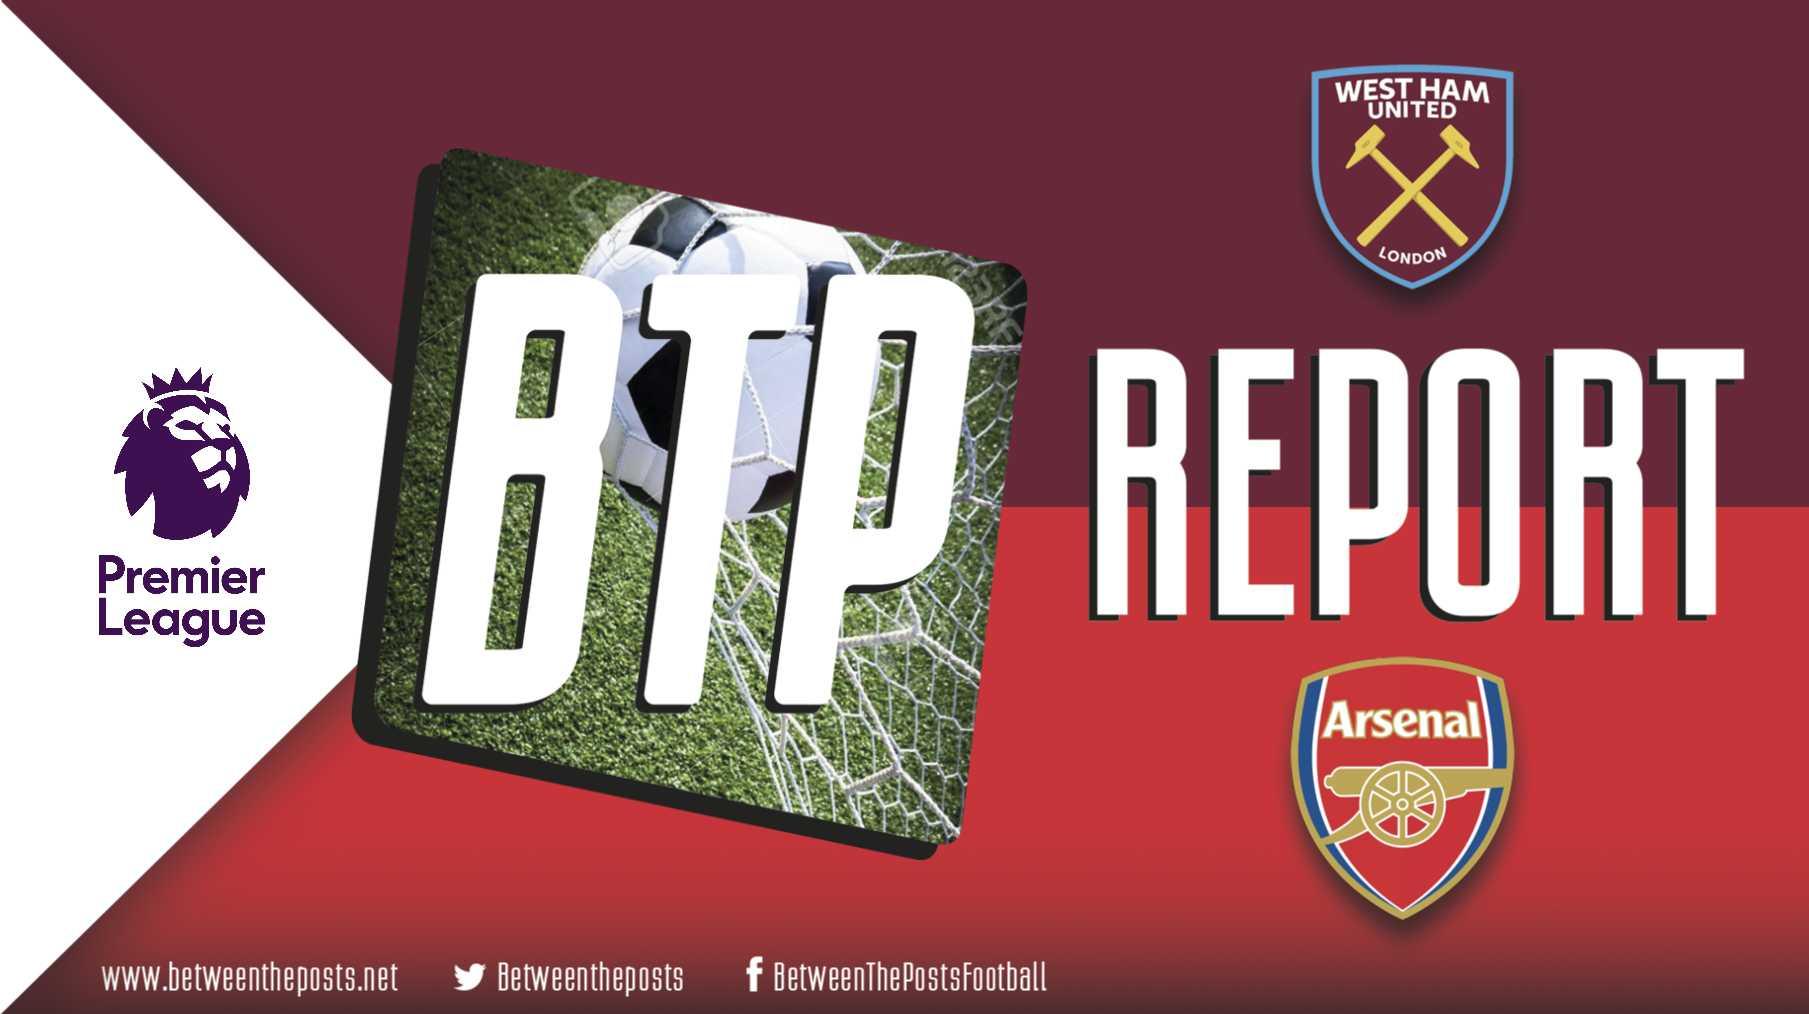 West Ham United - Arsenal 1-0 Premier League tactical analysis